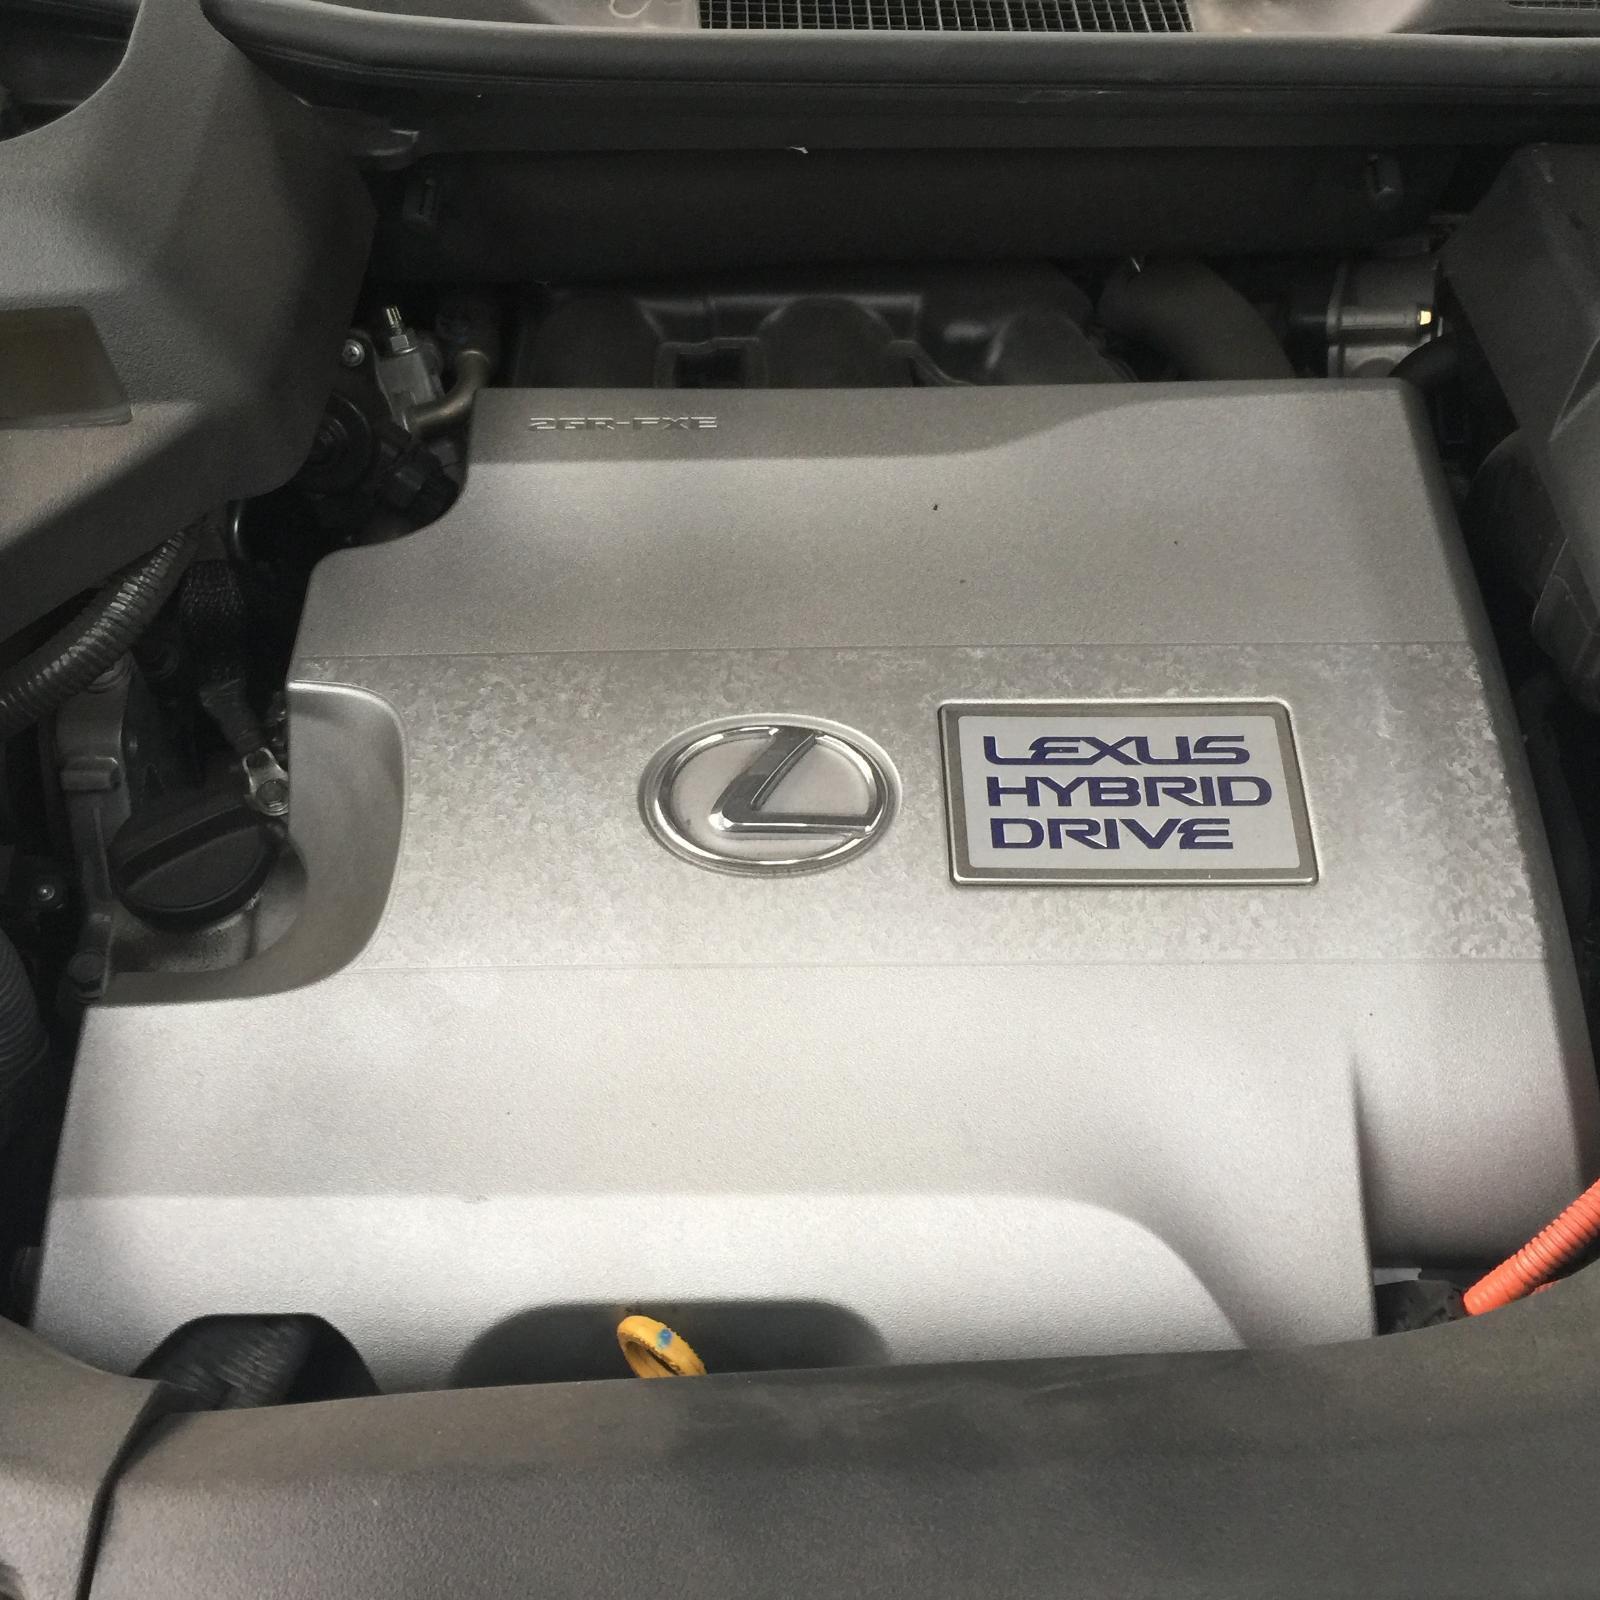 LEXUS RX350, Trans/Gearbox, AUTO, PETROL, 3.5, 2GR, GGL1#, HYBRID TYPE, RX450H, 03/09-09/15